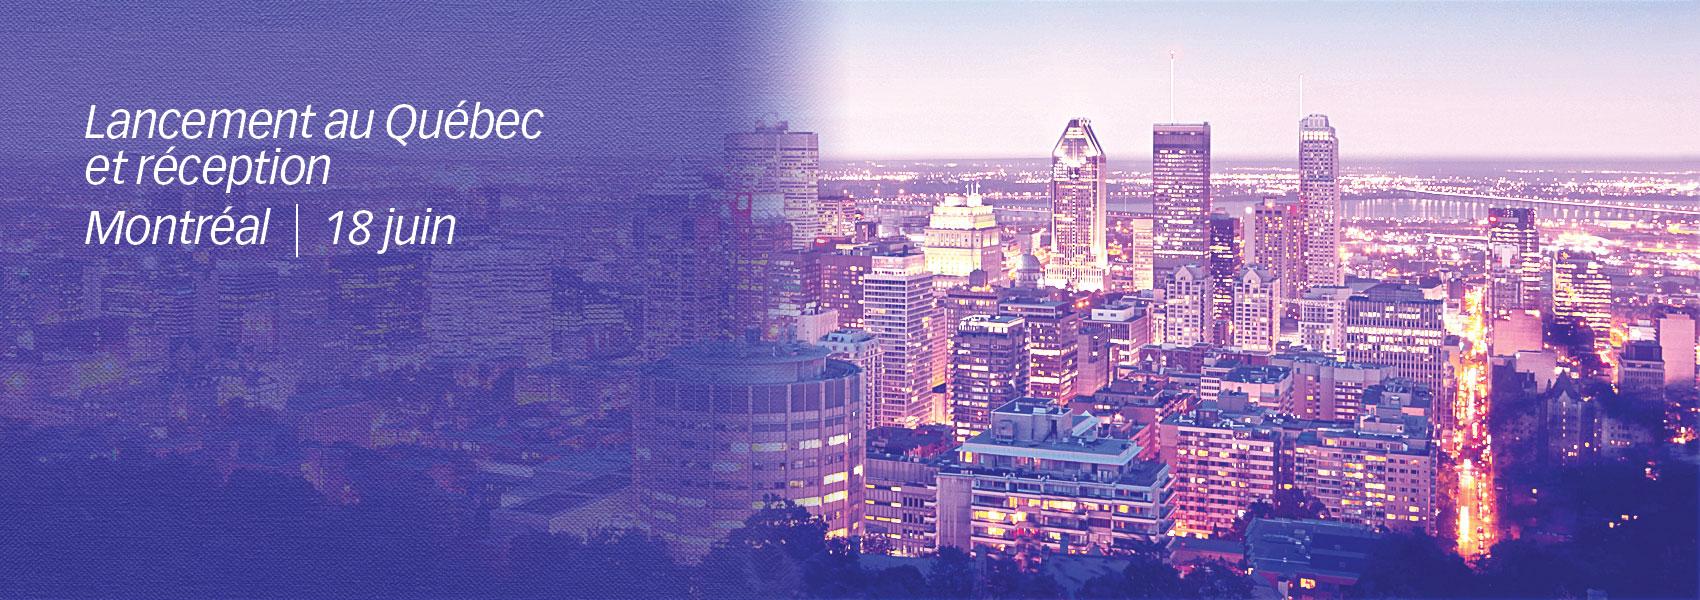 montreal_skyline_fr_thumb.jpg